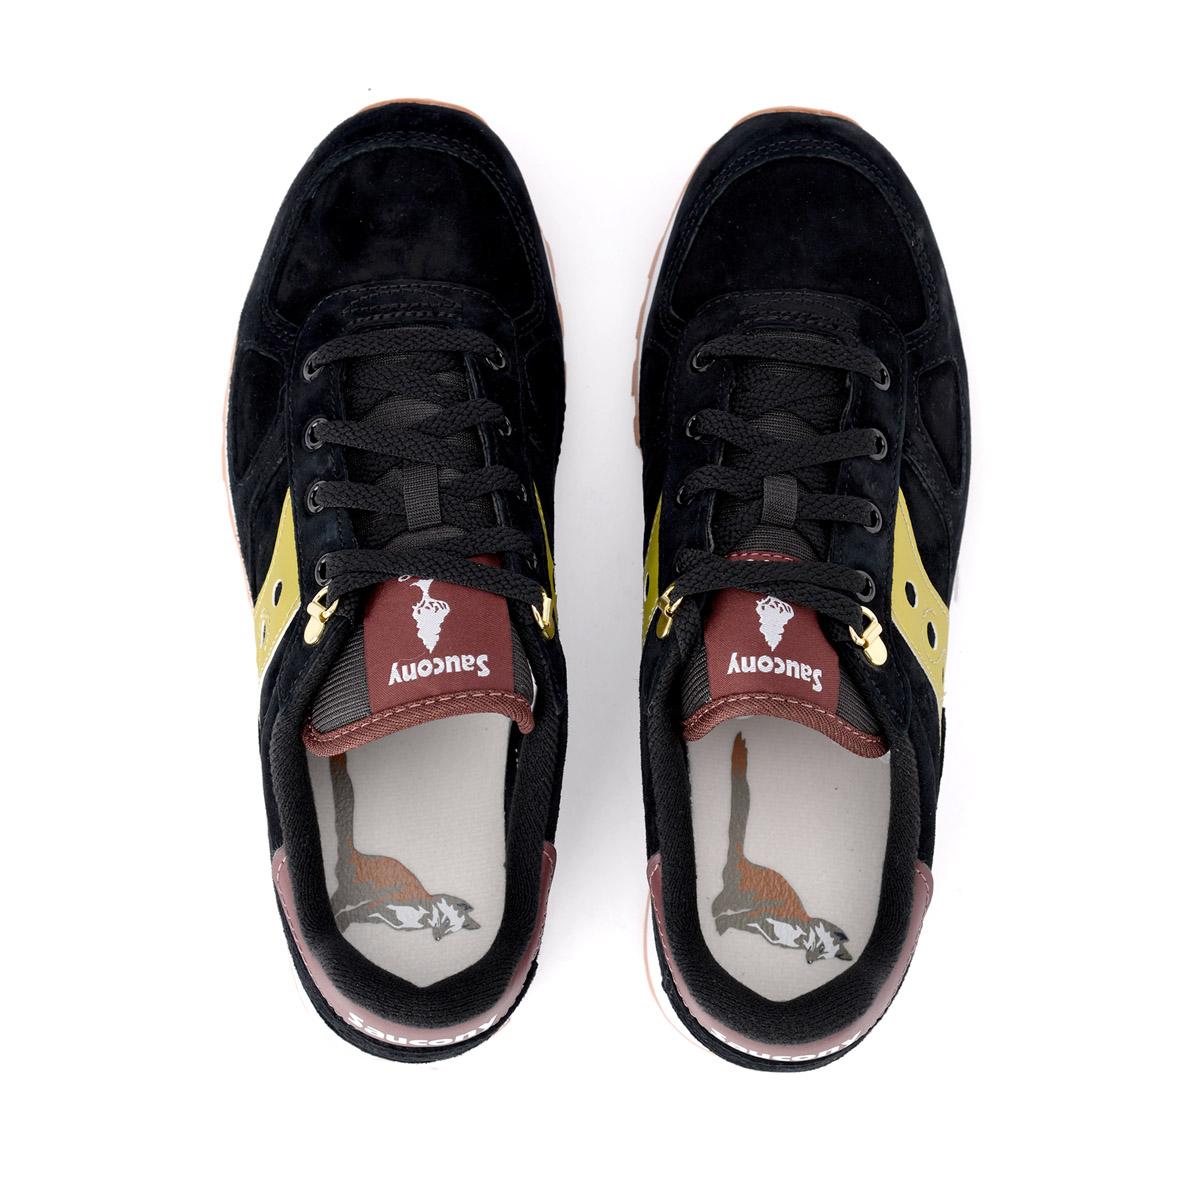 Pelle Saucony Sneaker Nero Shadow E Oro Giallo Suede In p4qYdqw